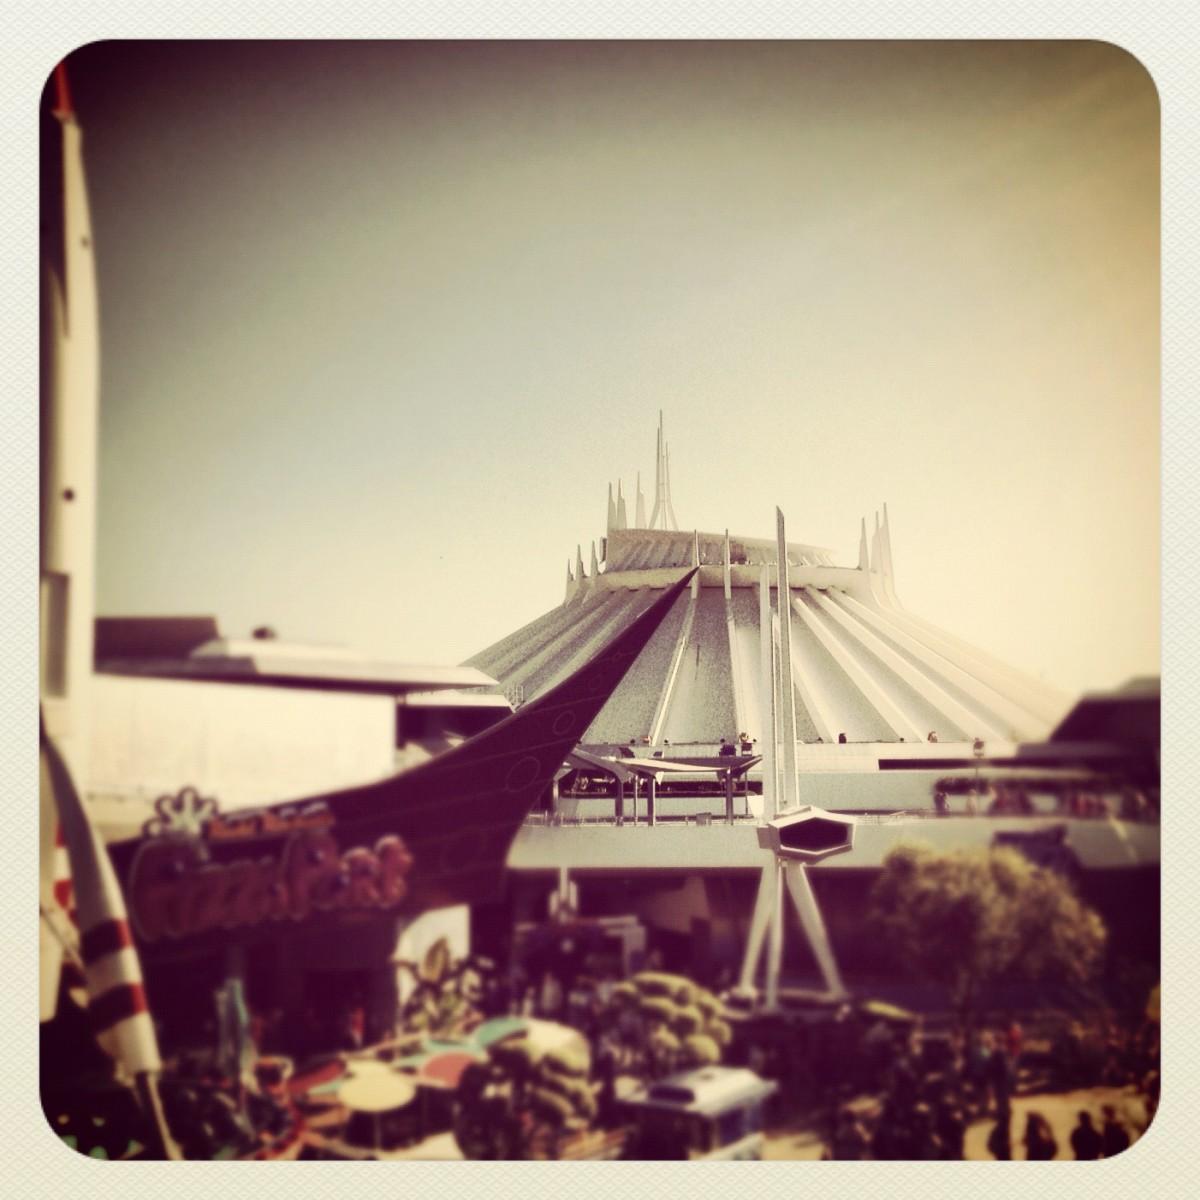 Tomorrowland, present day